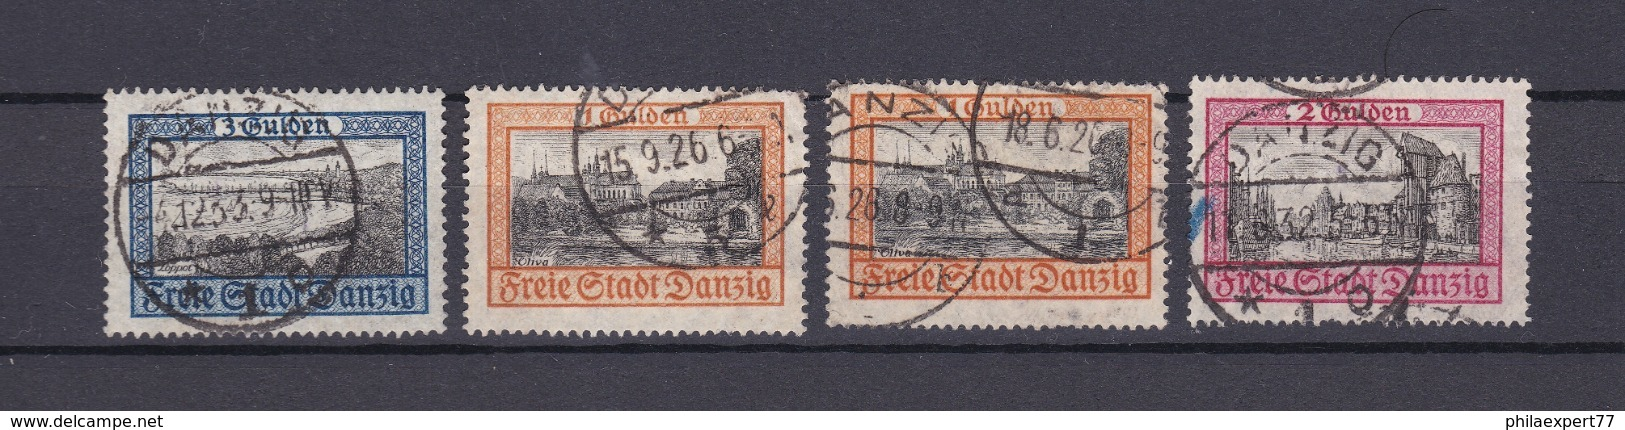 Danzig - 1924/32 - Michel Nr. 209+212/13 - Gest. - 36 Euro - Danzig